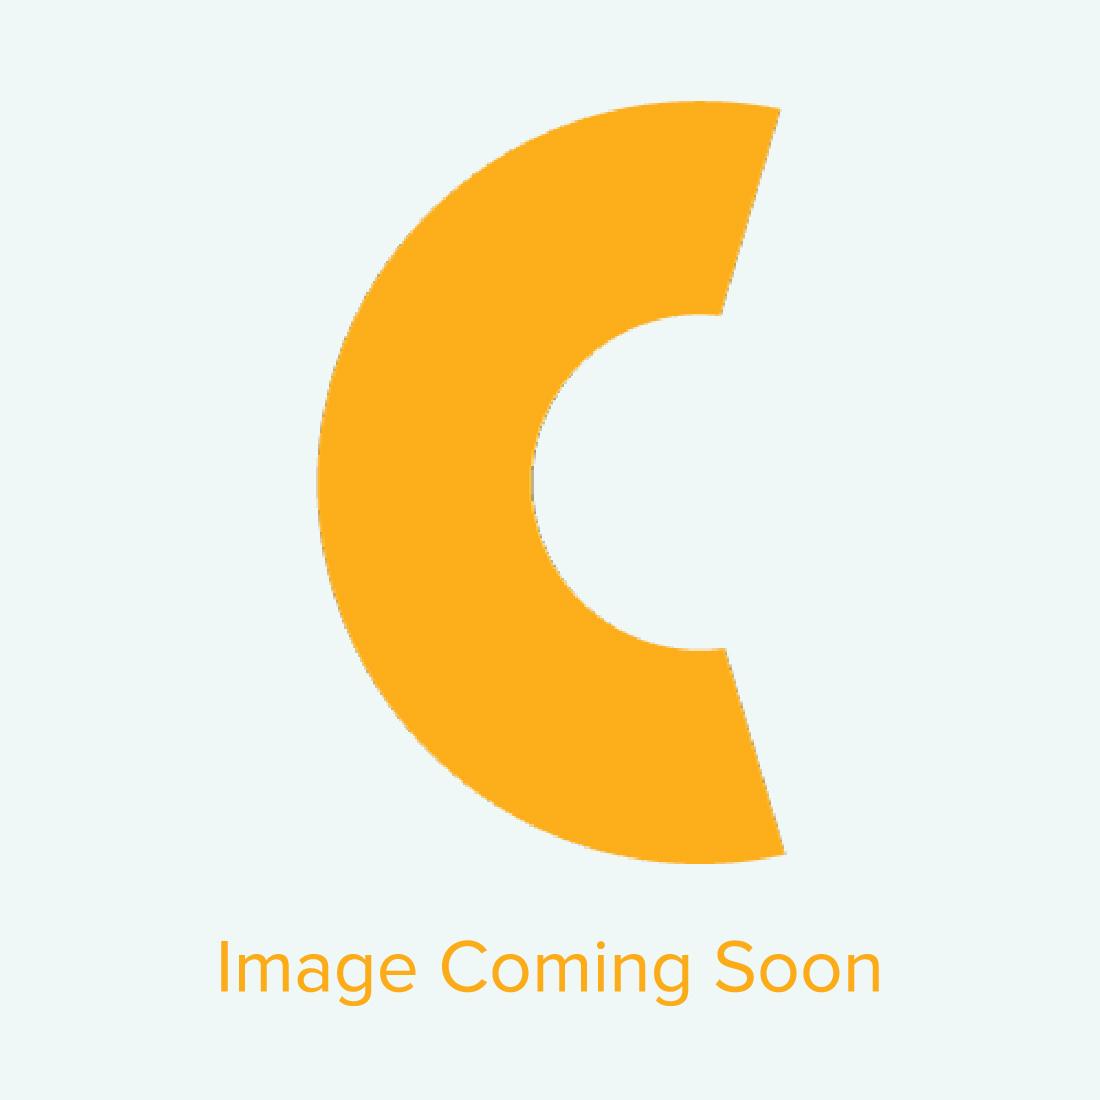 Silhouette Connect Plug-In for Adobe Illustrator and CorelDraw